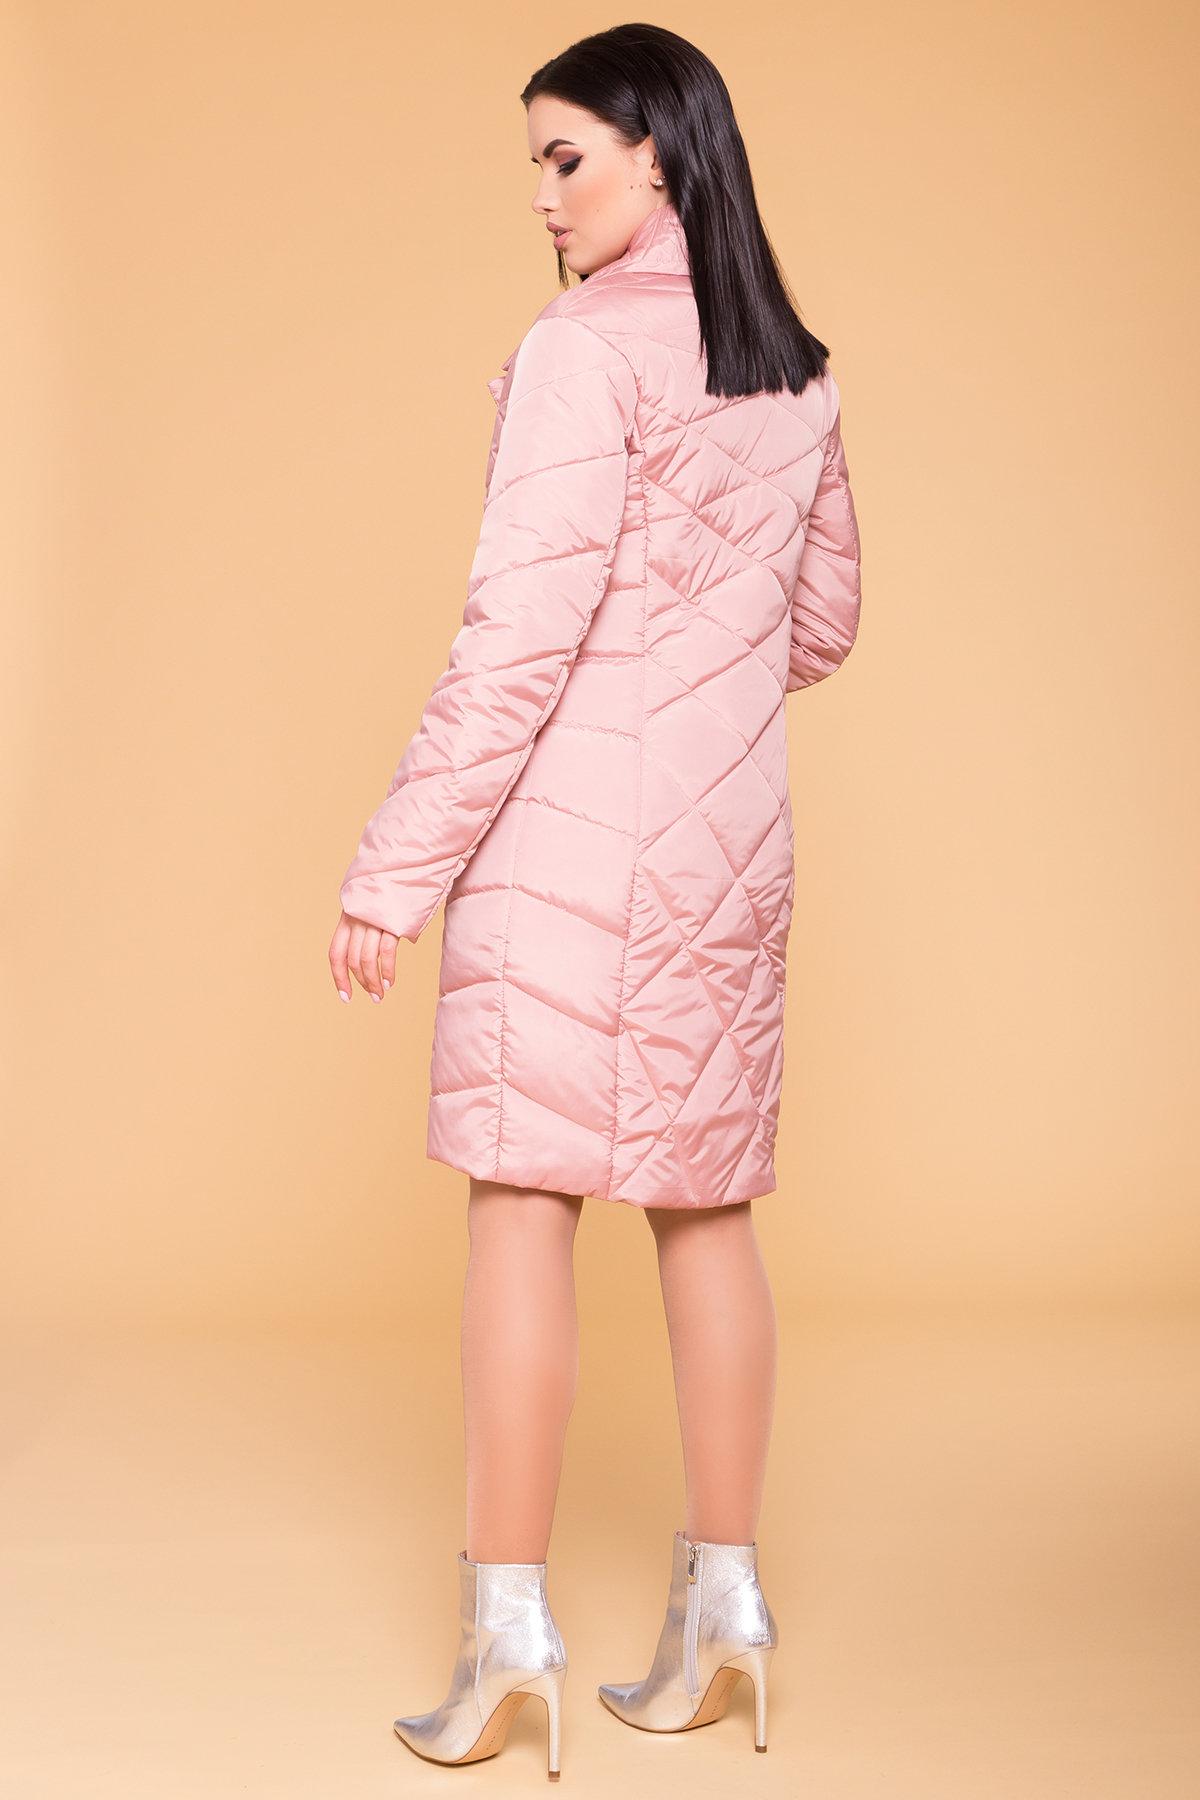 Пальто Сандра 6422 АРТ. 41356 Цвет: Пудра - фото 2, интернет магазин tm-modus.ru